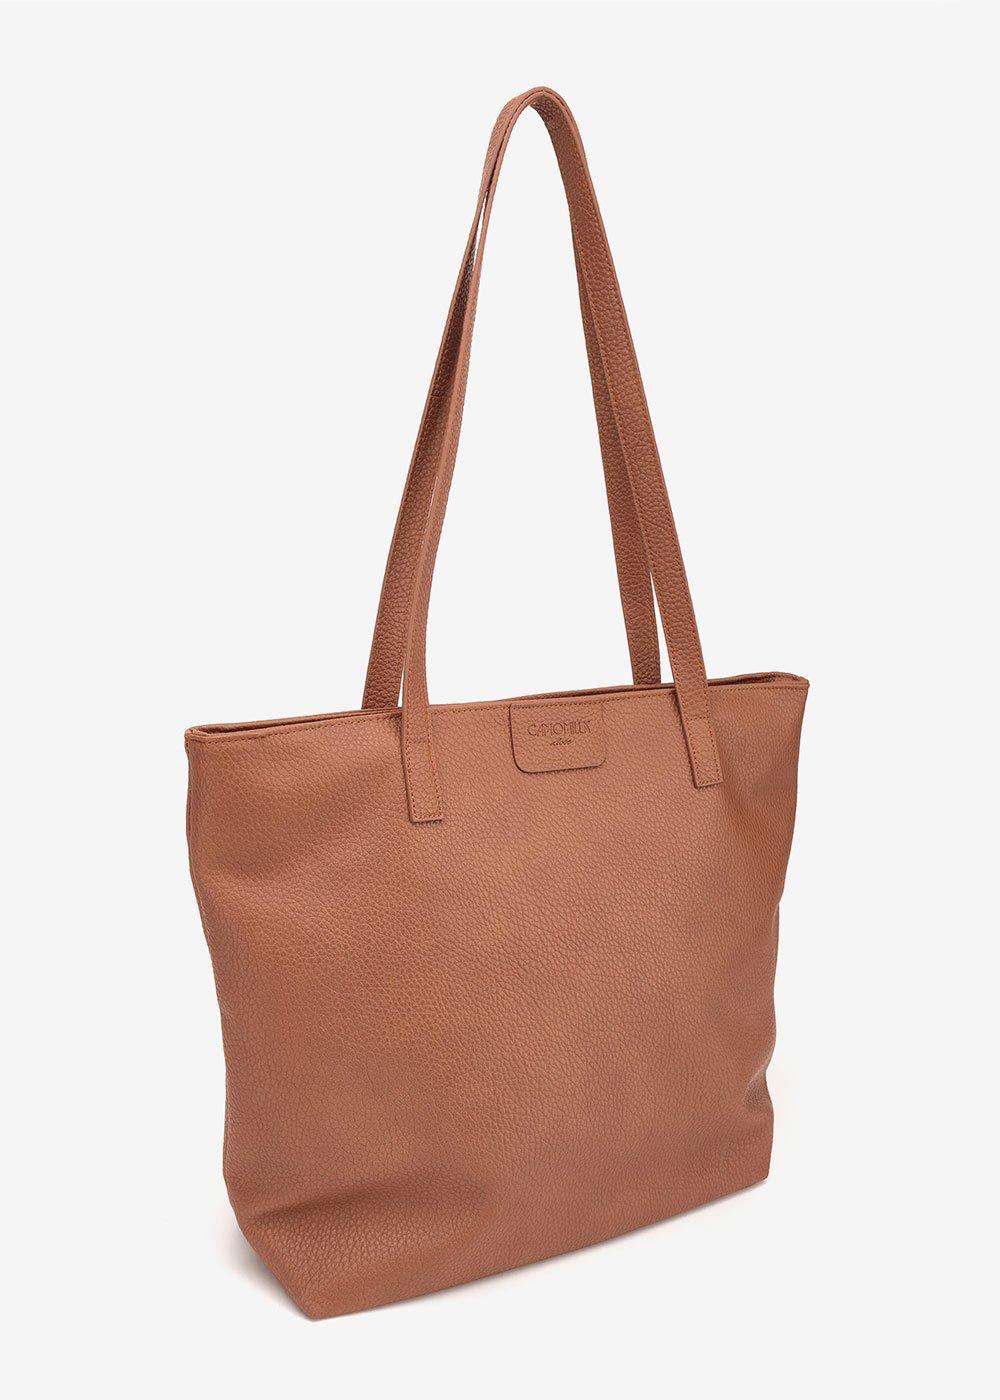 Badiascer shopping bag with deer print - Brown - Woman